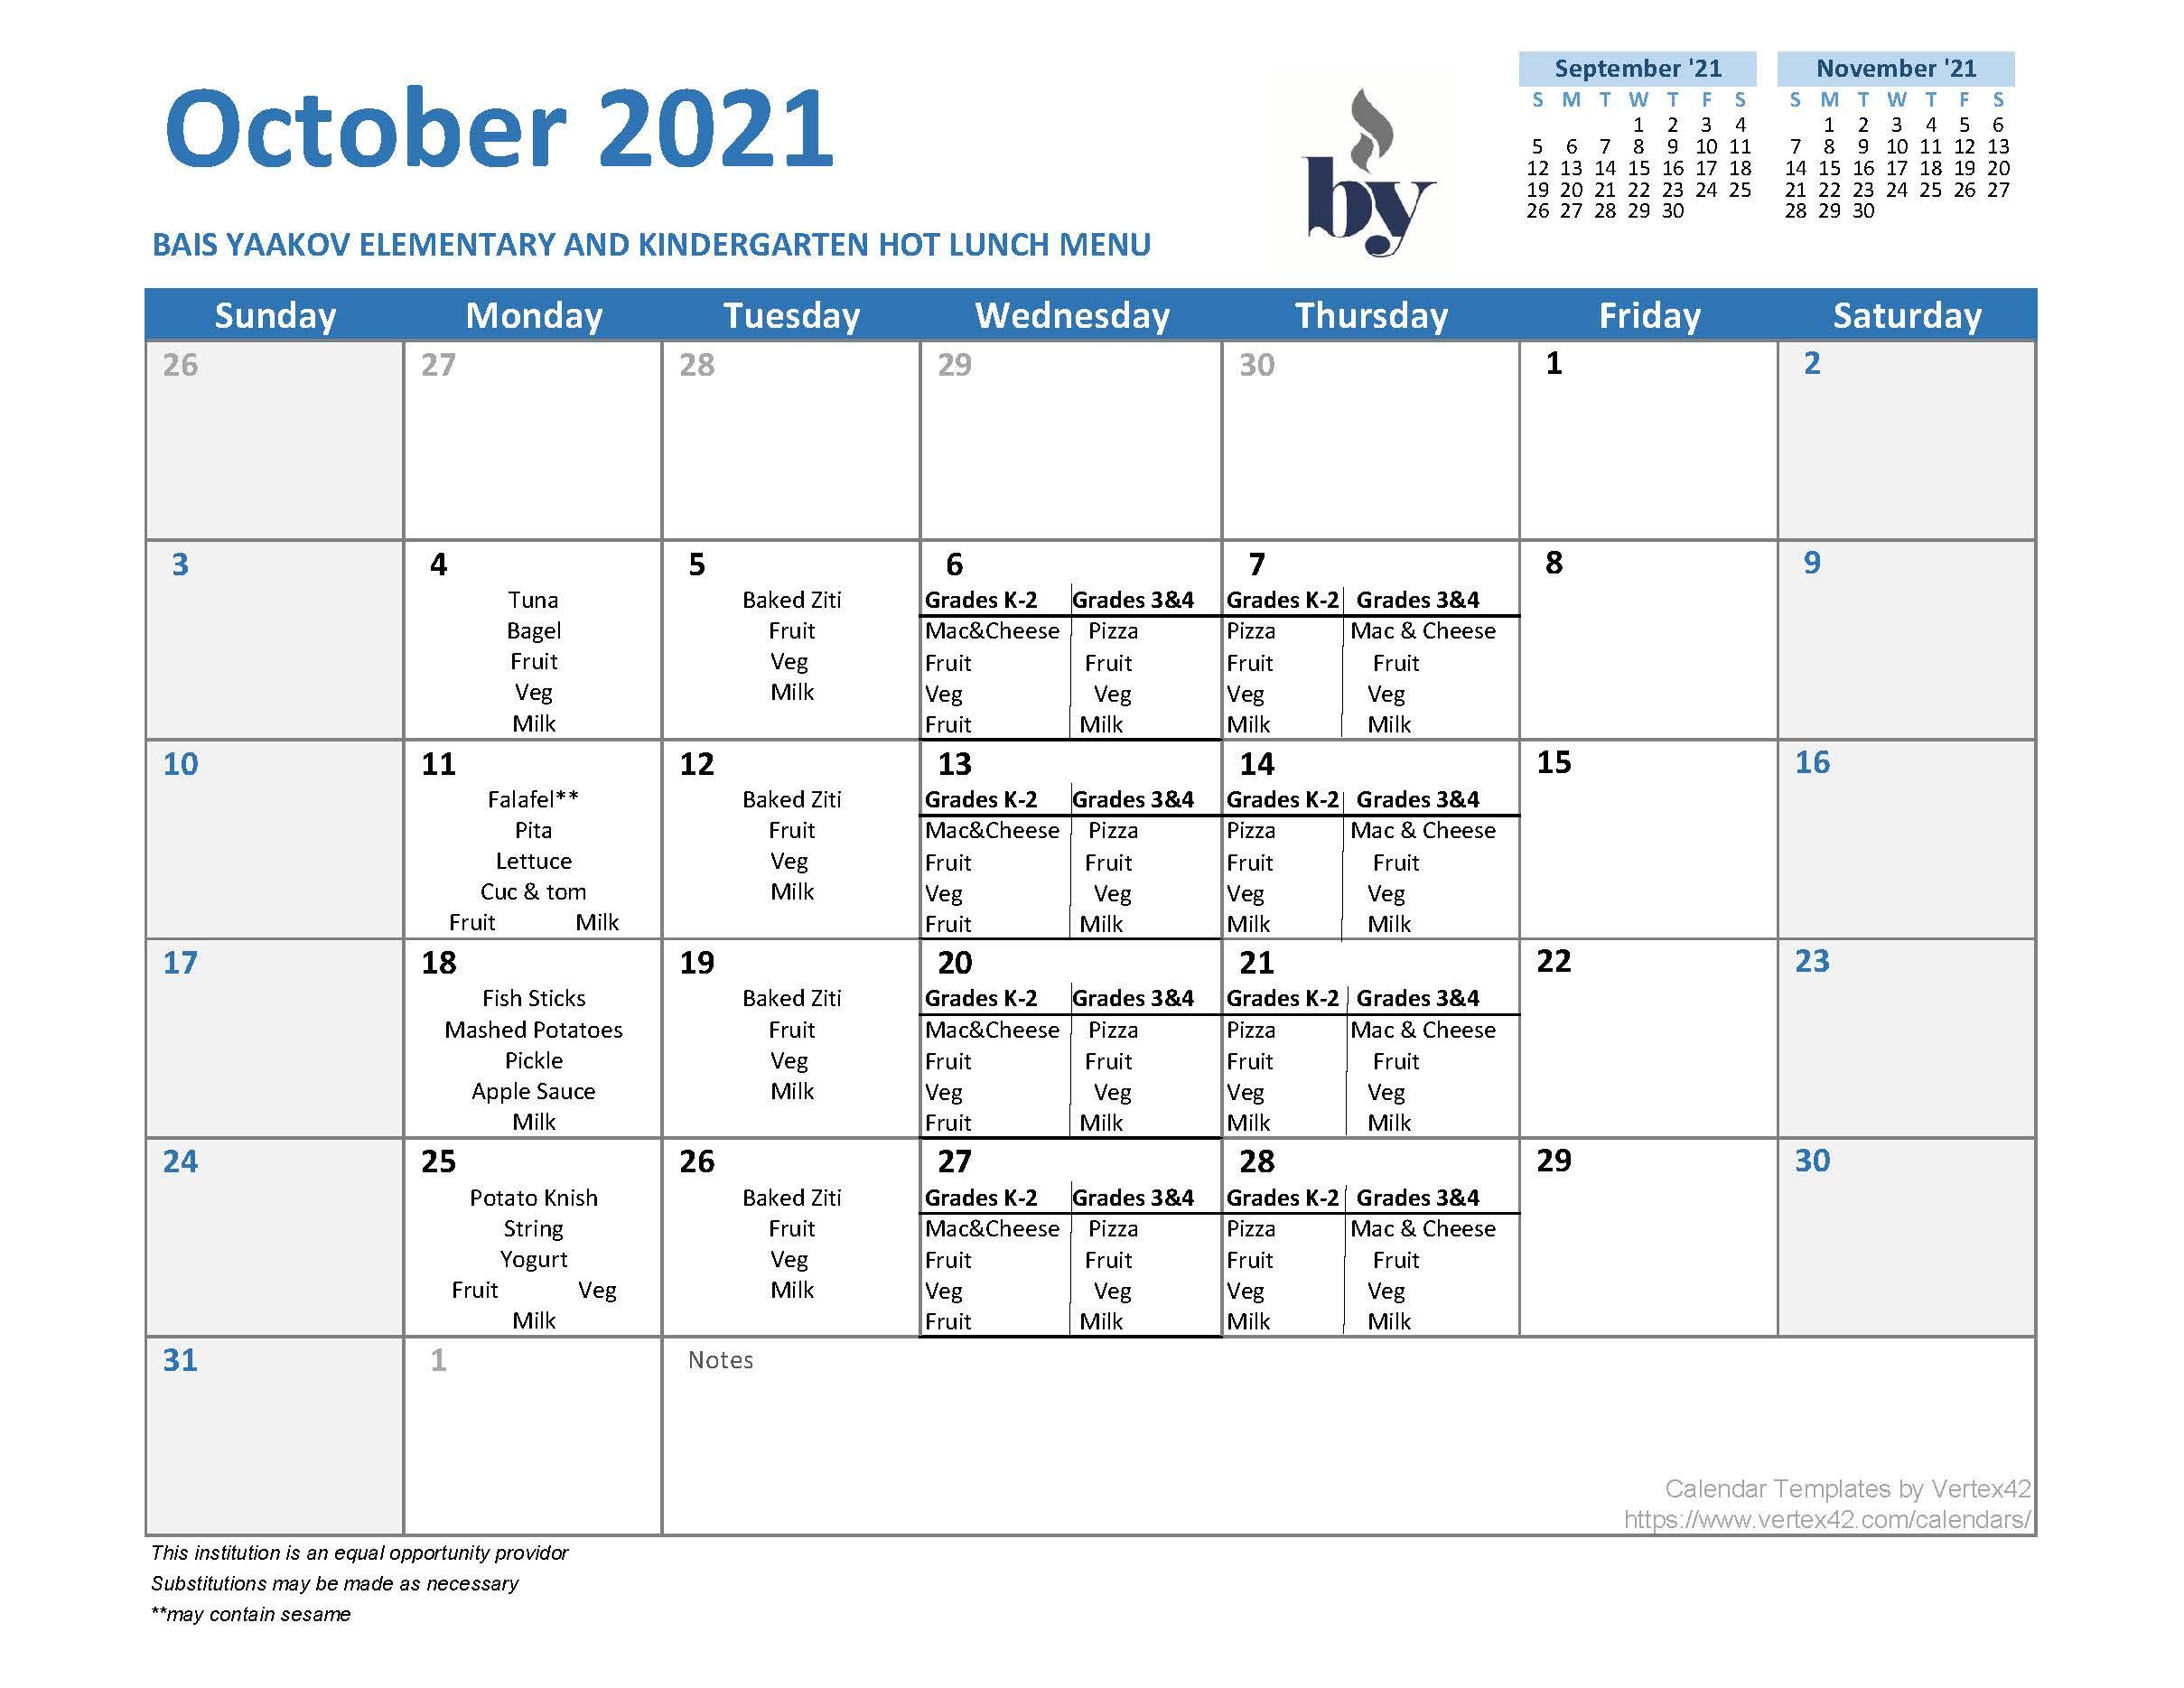 Elementary School Menu - October